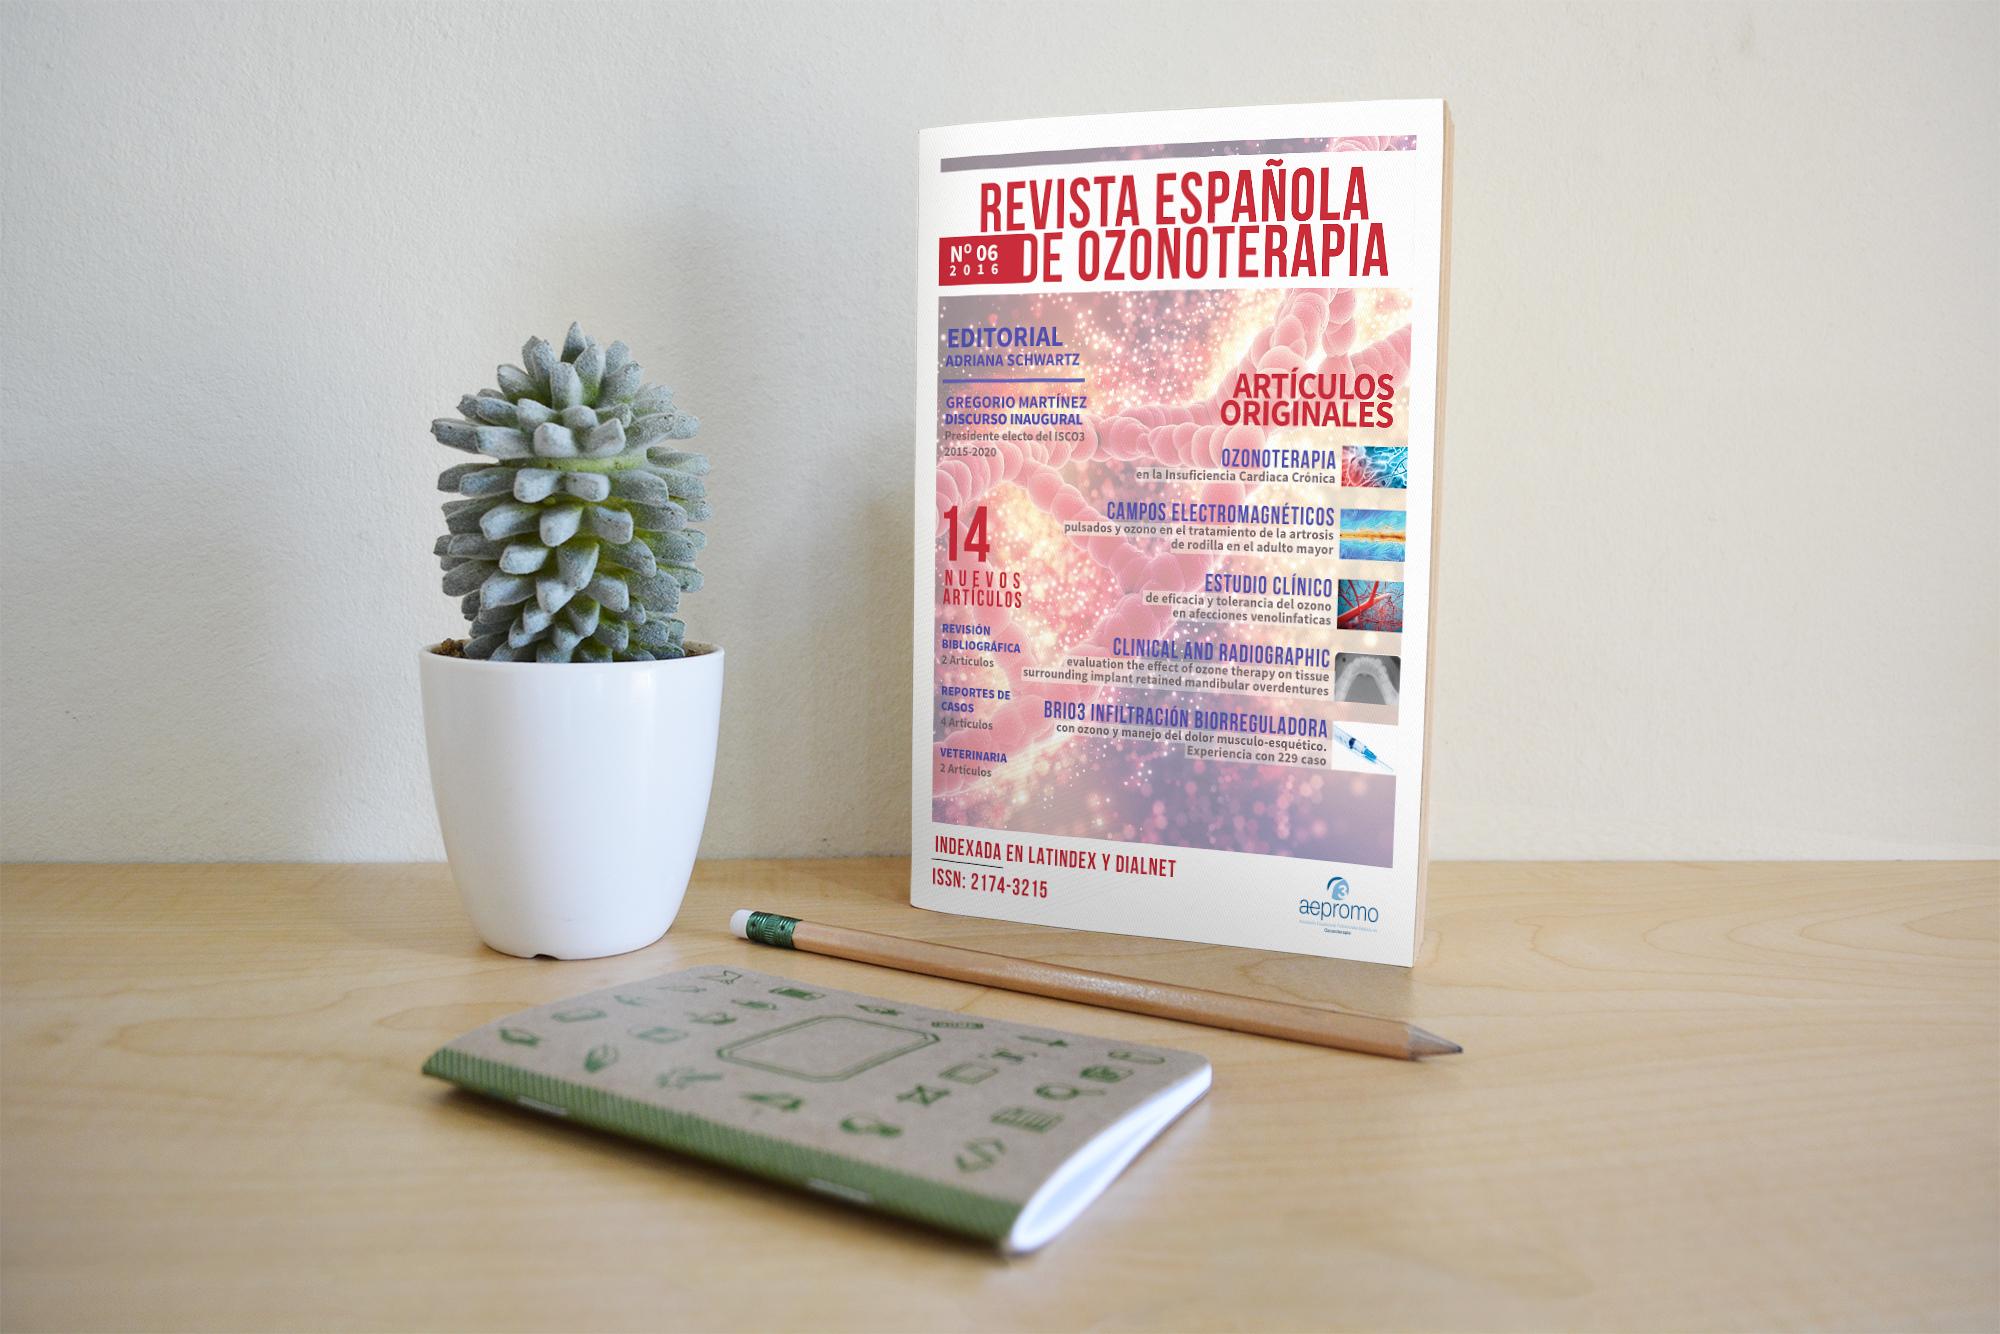 Mockup PORTADA REVISTA ESPAÑOLA DE OZONOTERAPIA - 6